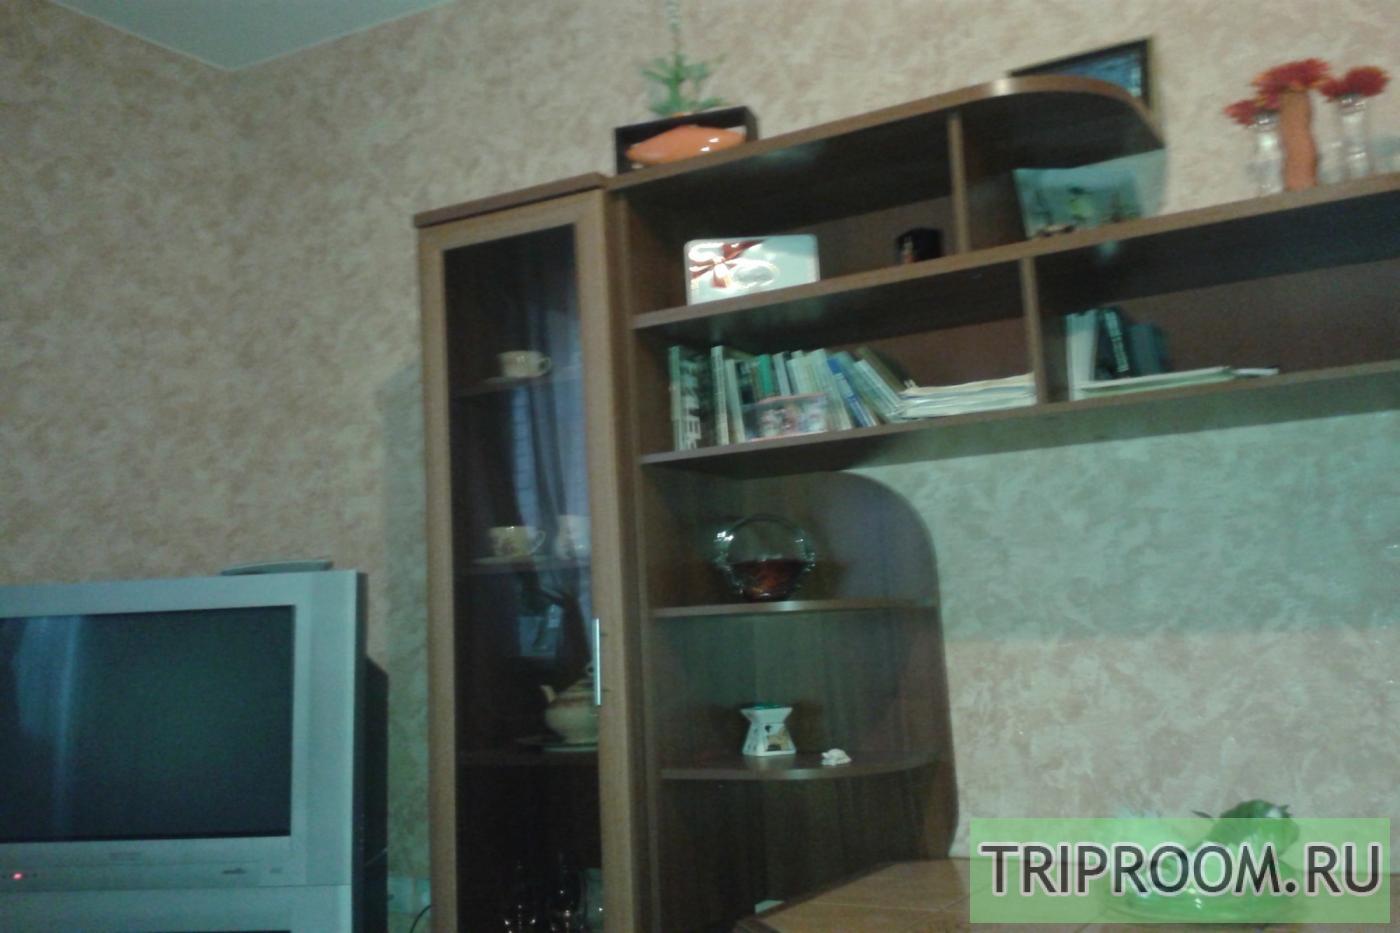 2-комнатная квартира посуточно (вариант № 6171), ул. Аделя Кутуя улица, фото № 6